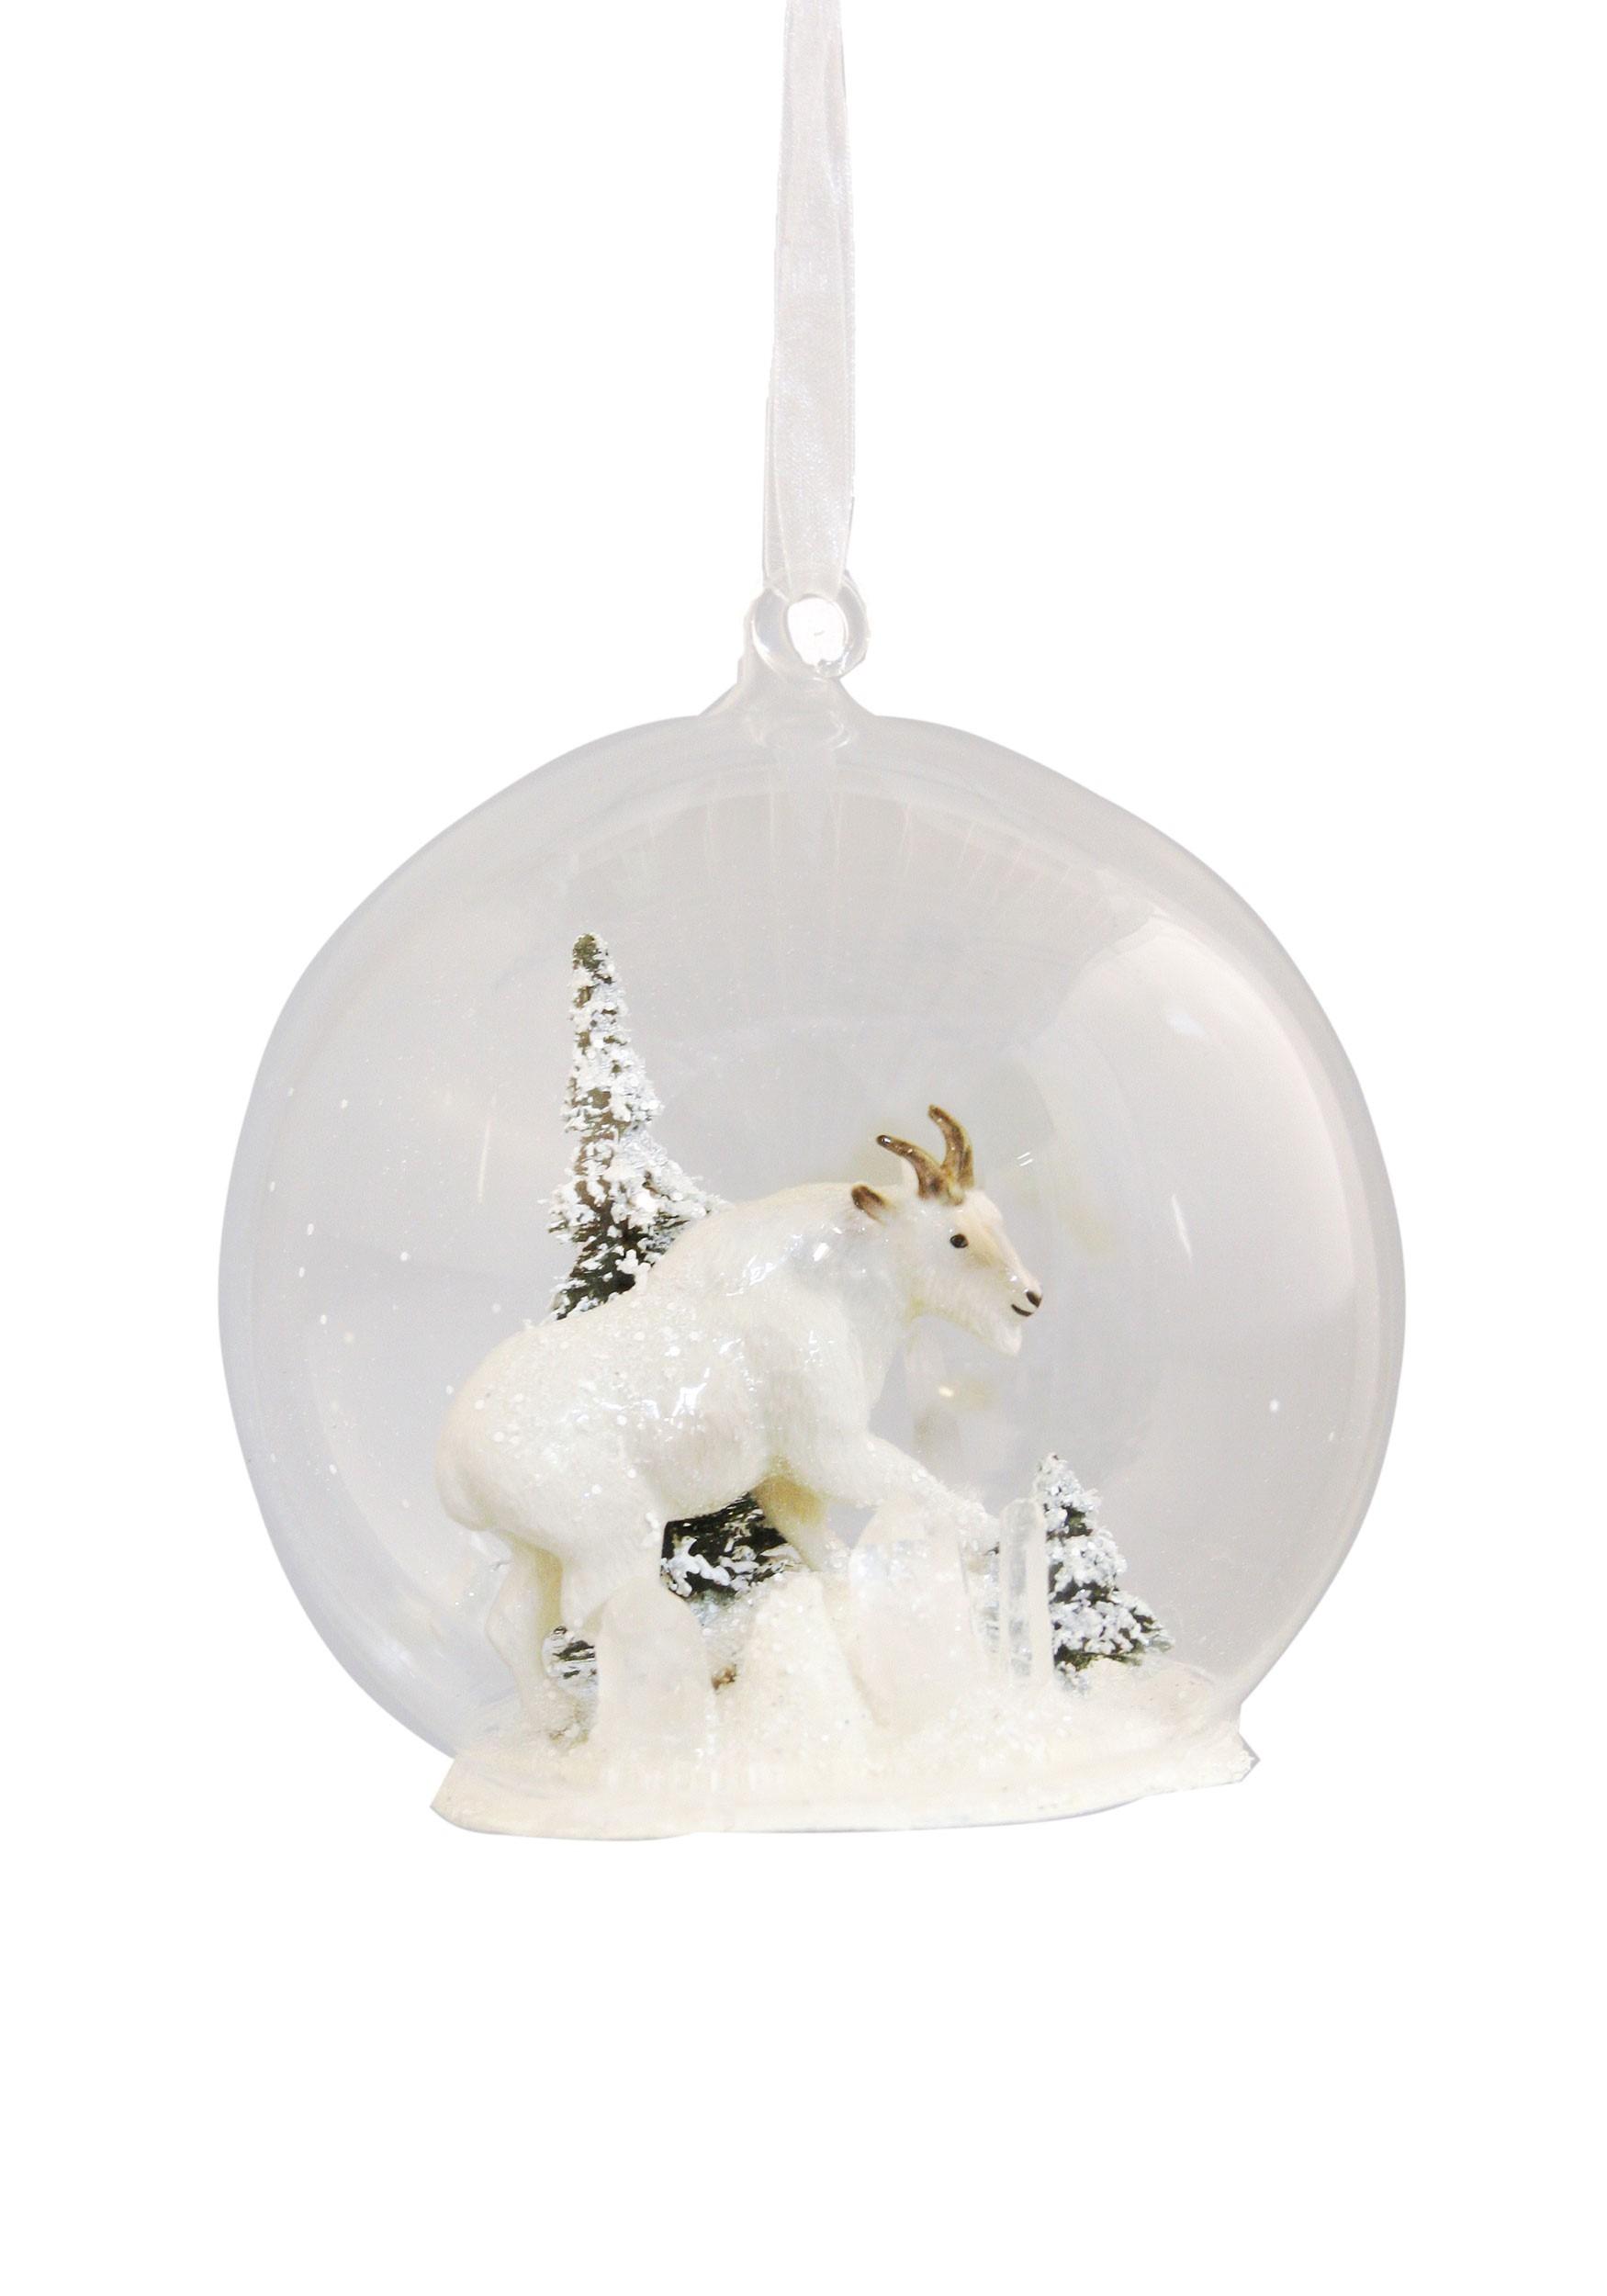 Goat Christmas Ornament.Winter Mountain Goat Glass Globe Christmas Ornament